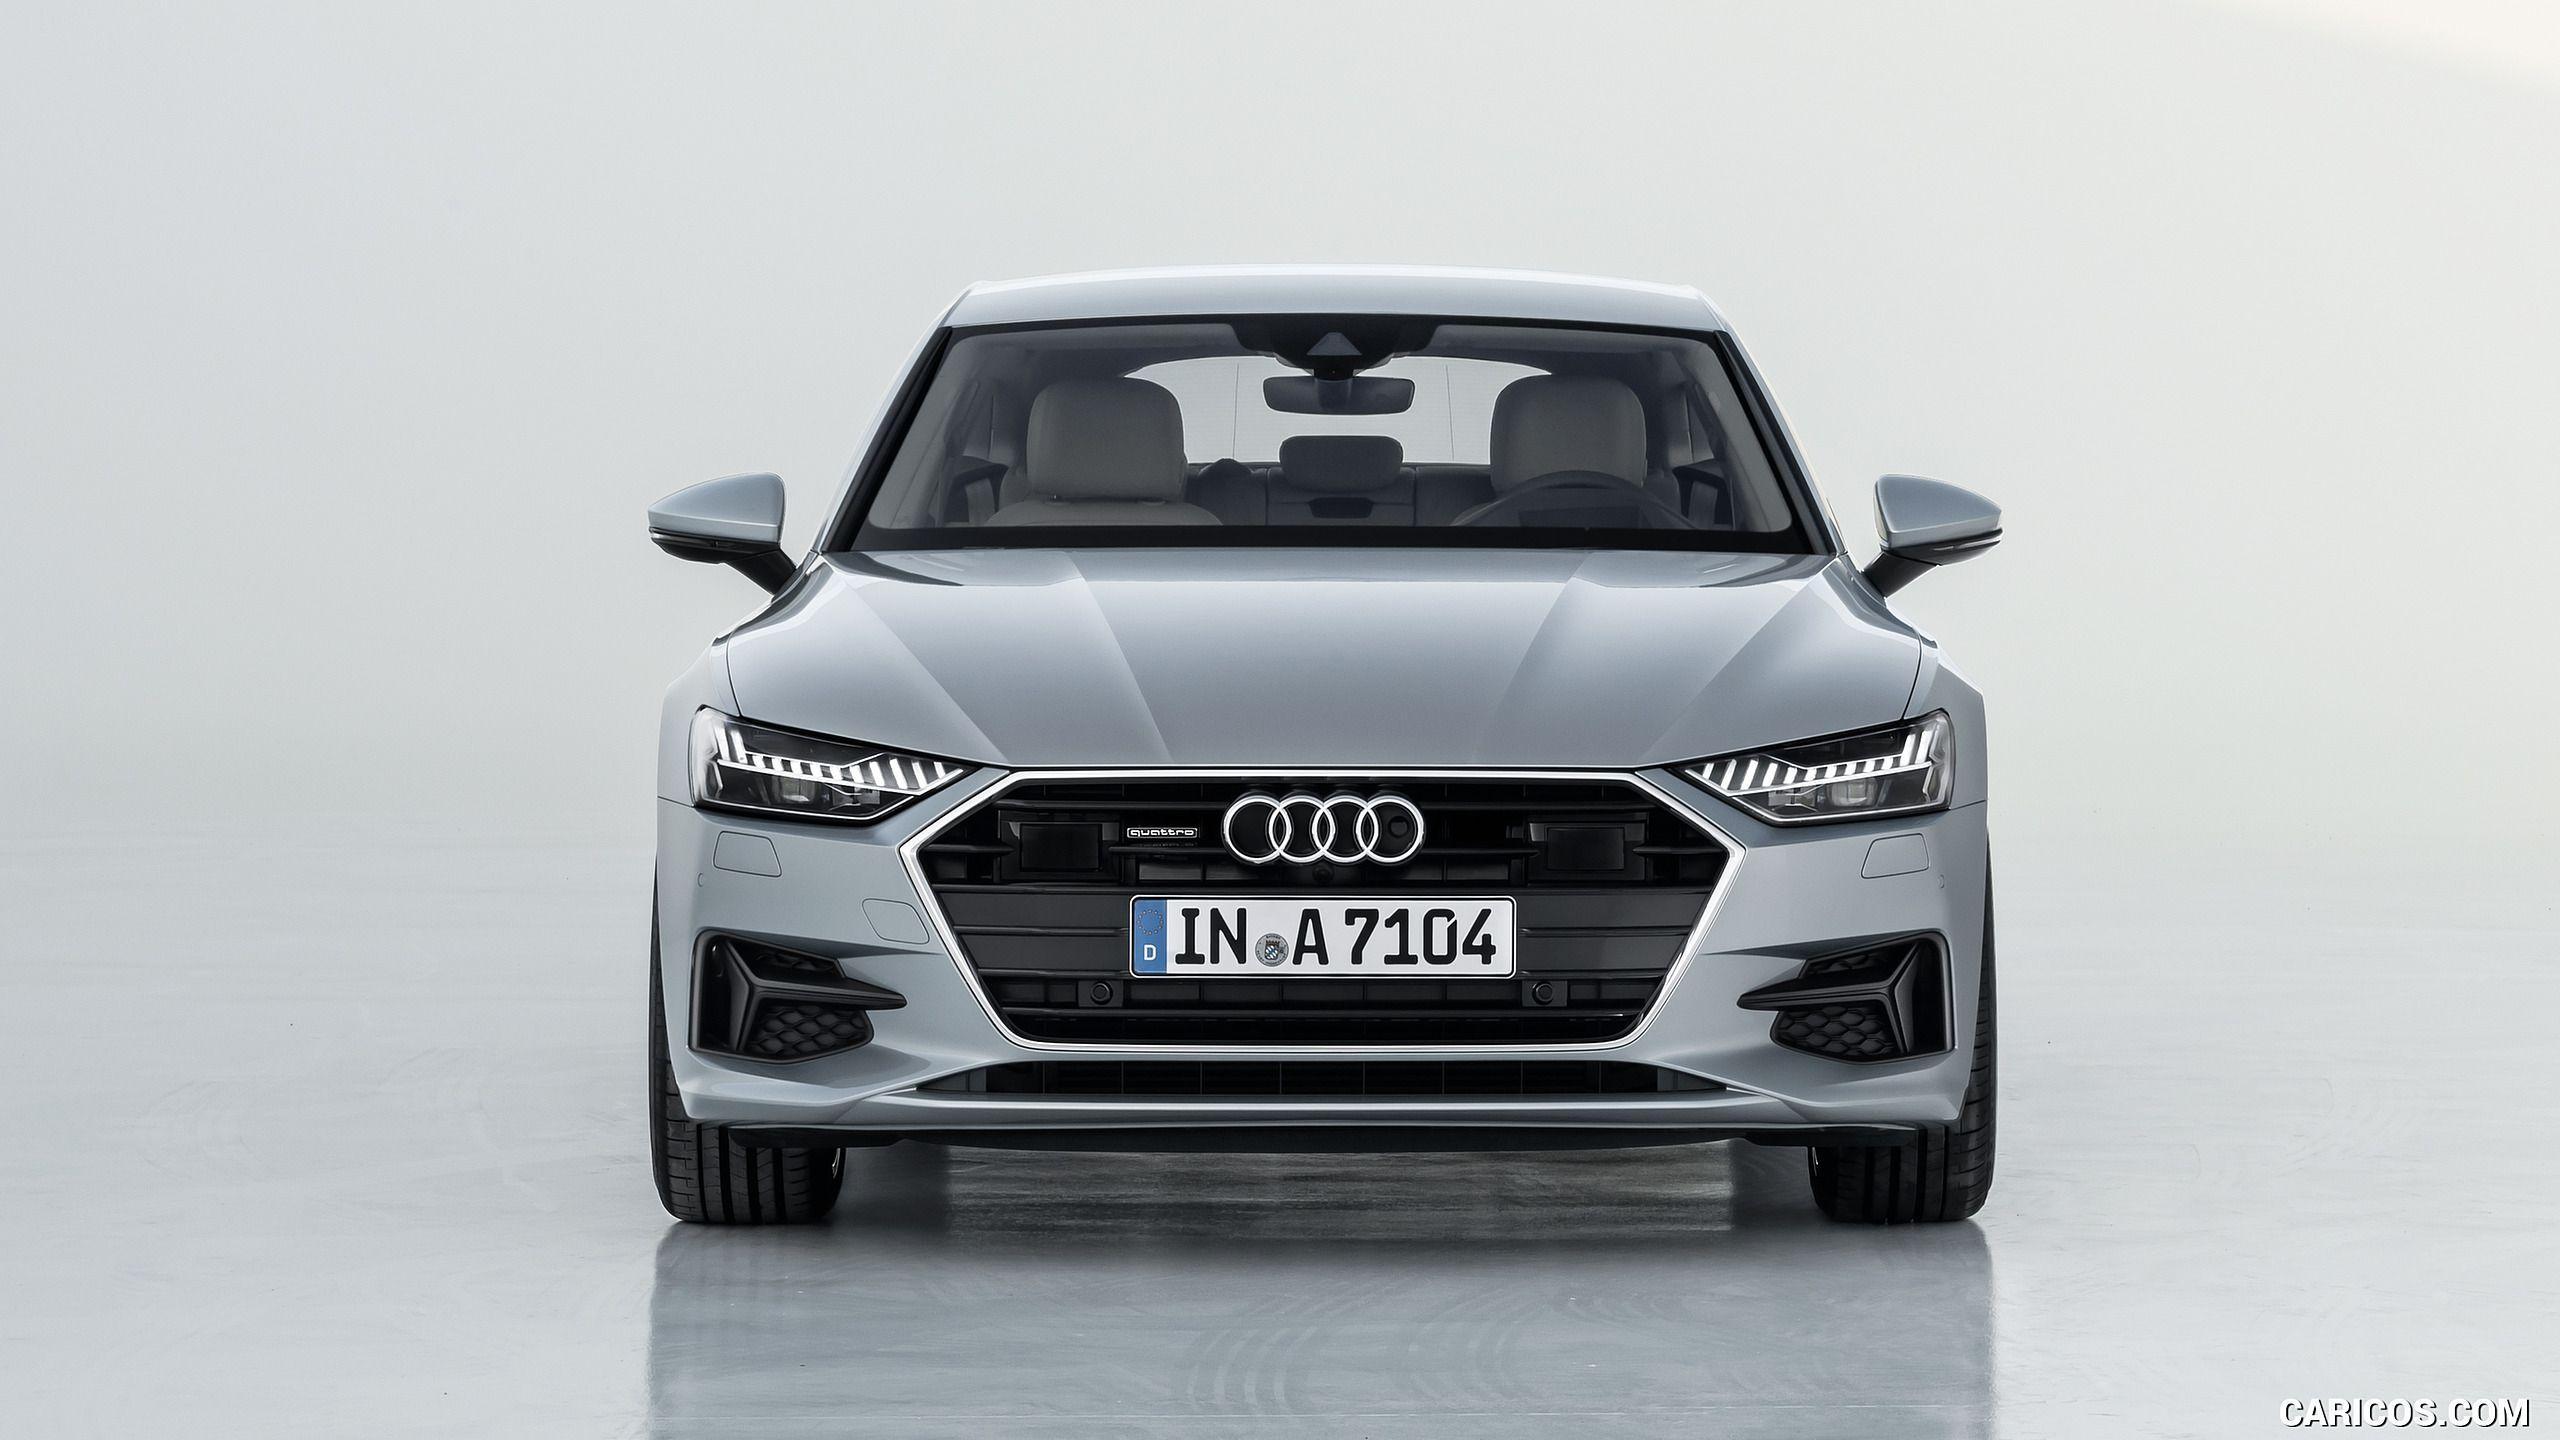 2019 Audi A7 Sportback Wallpaper Automotive Pinterest Audi A7